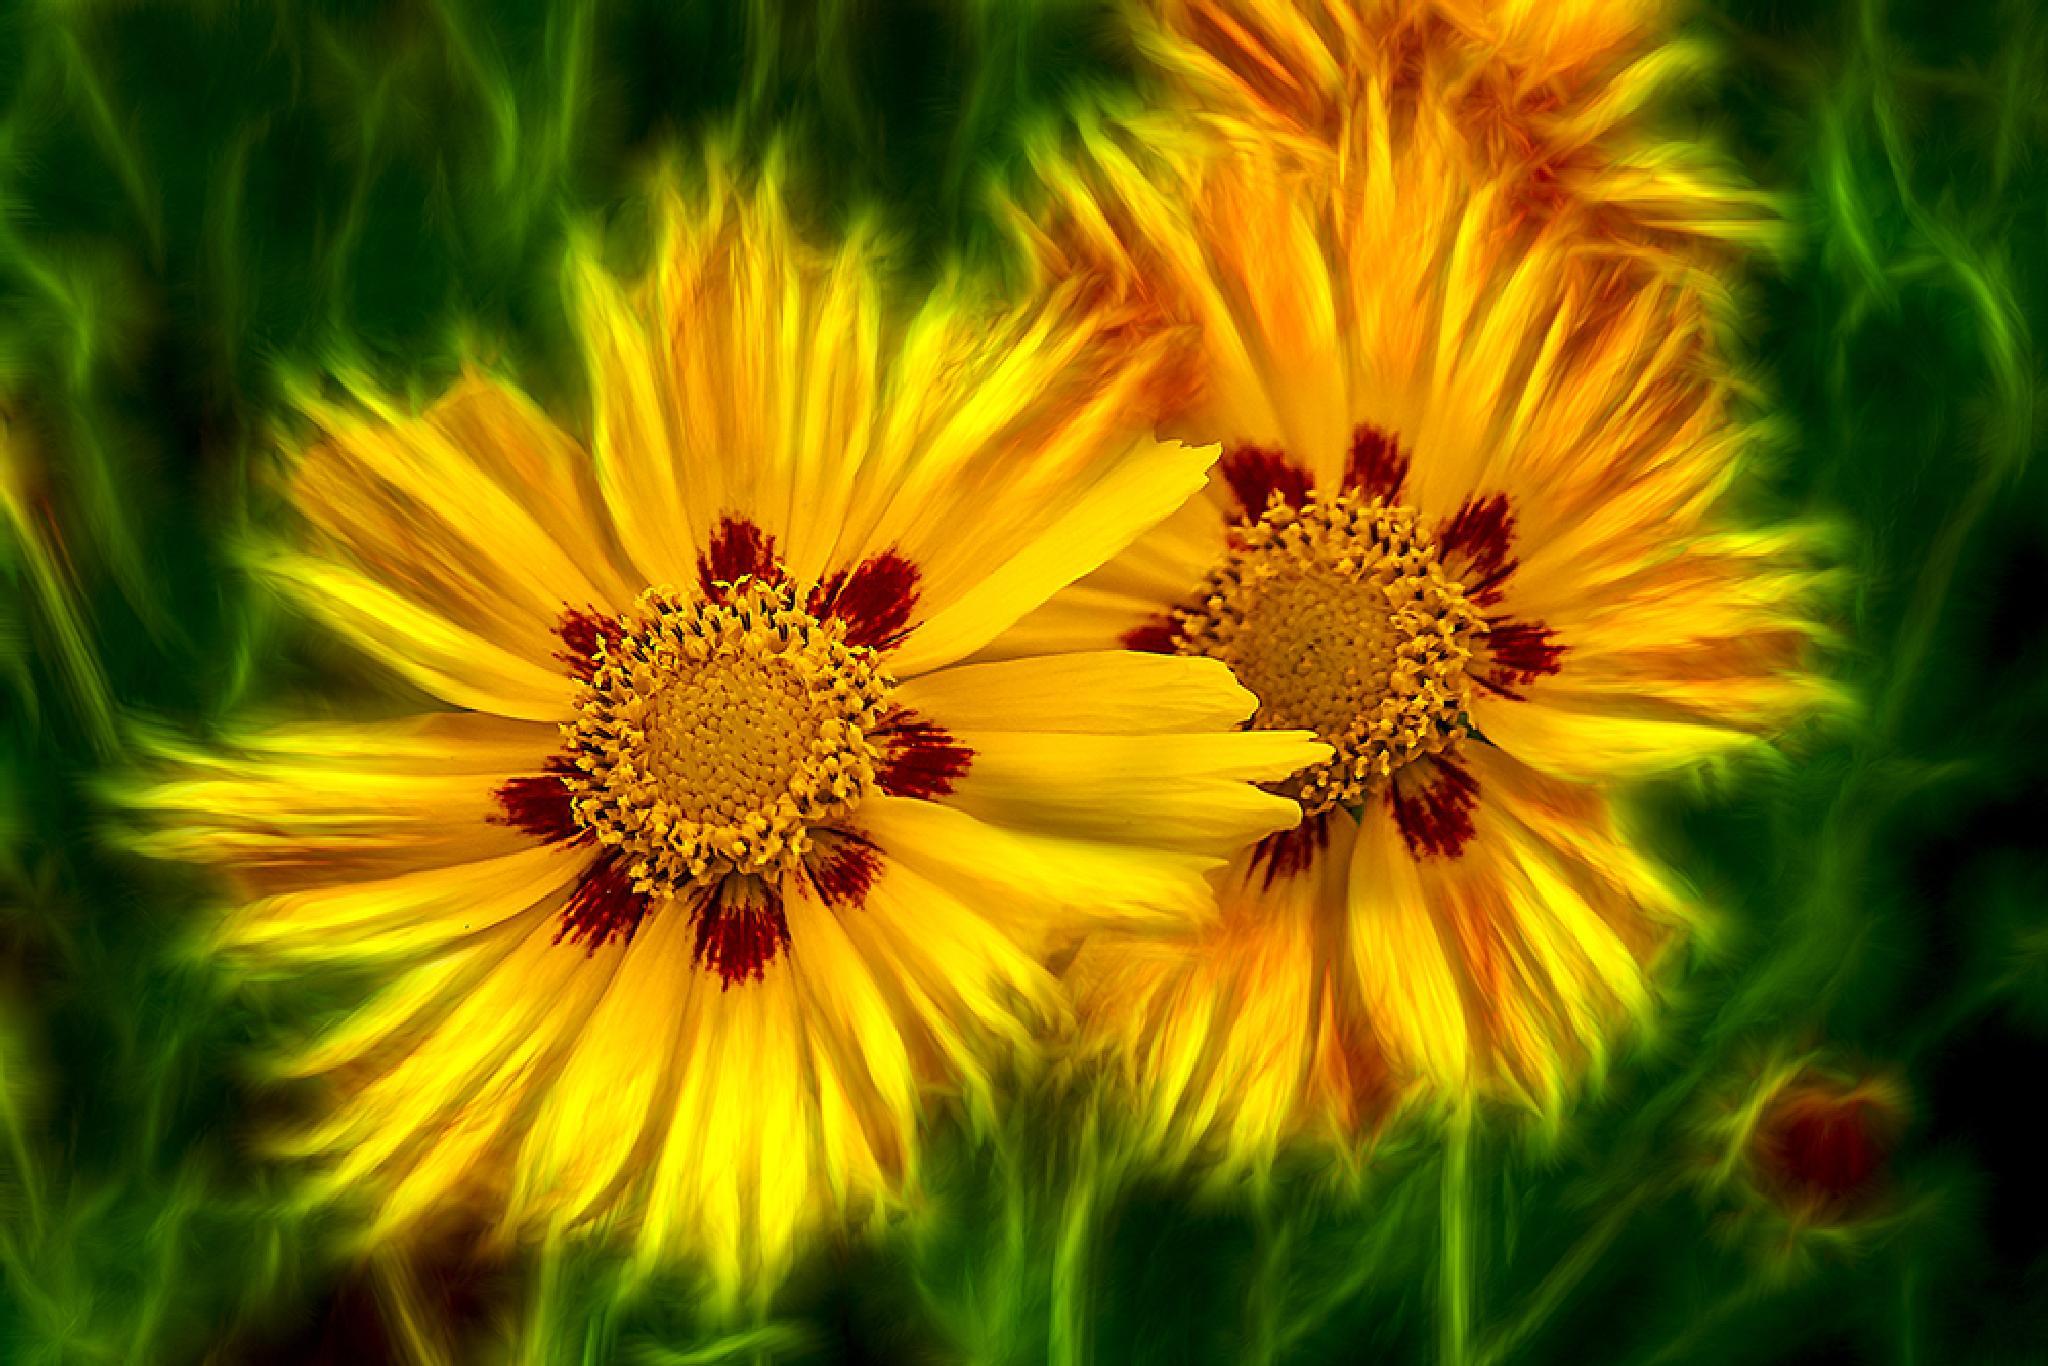 Blooming beauties by AdolfBeck